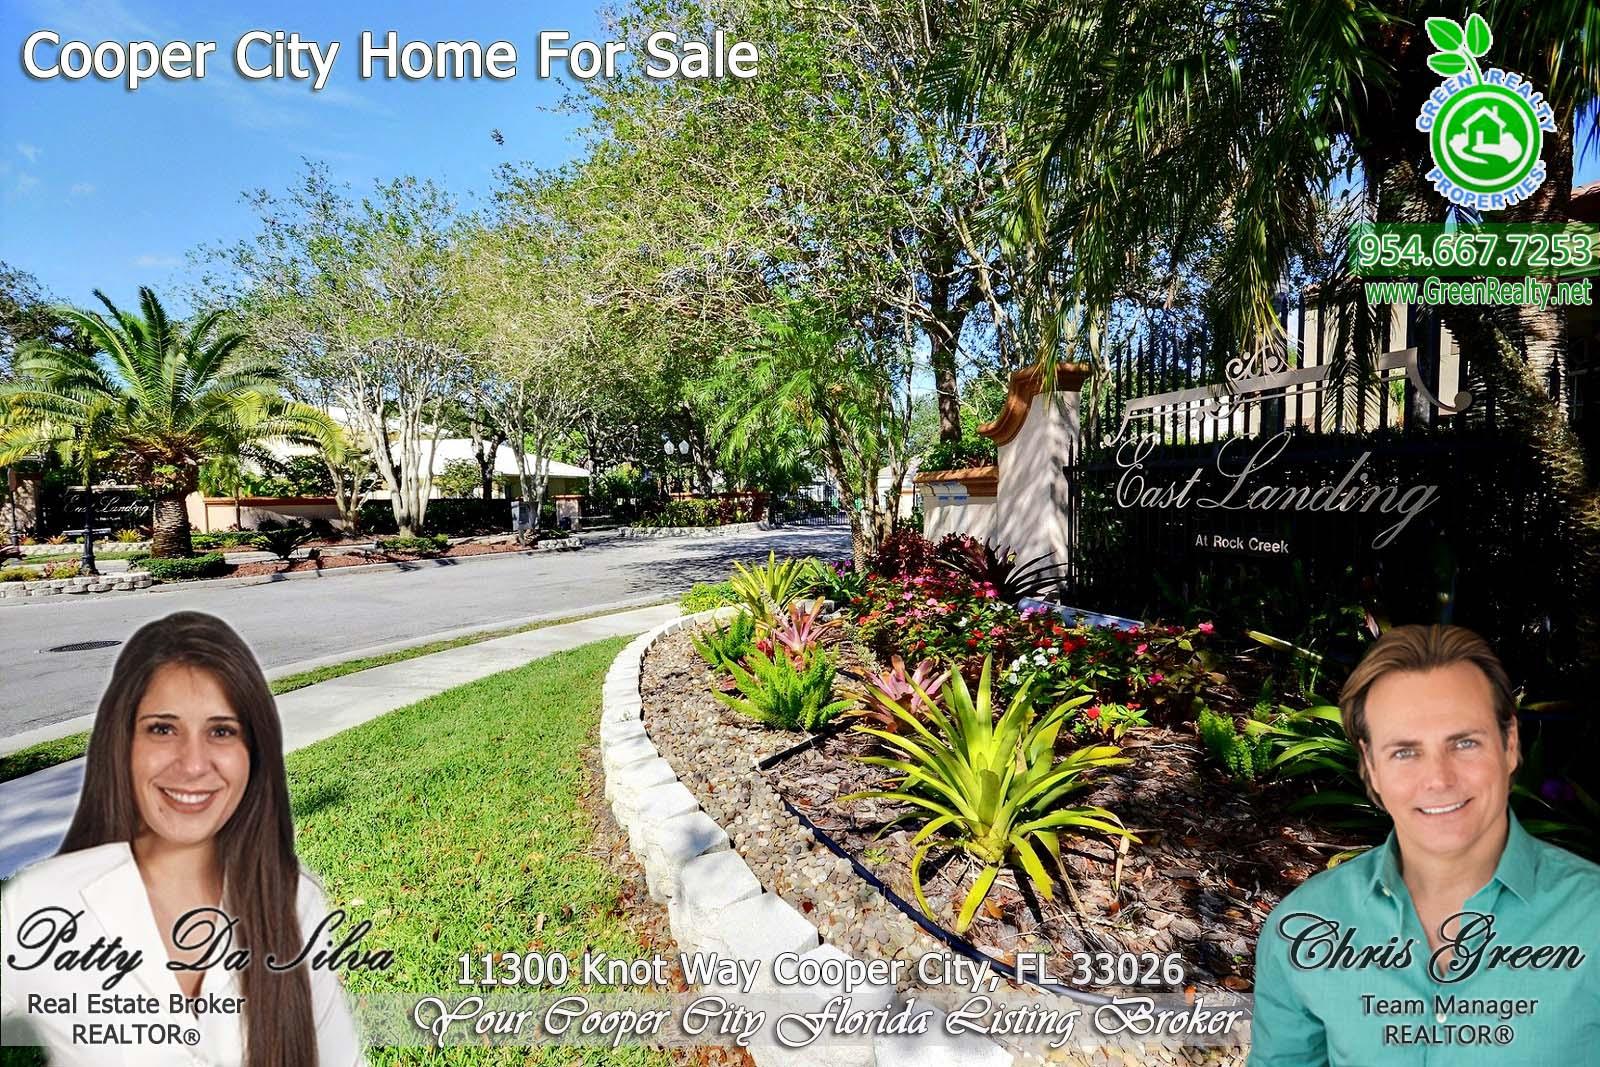 55 East Landing at Rock Creek Homes For Sale (2)